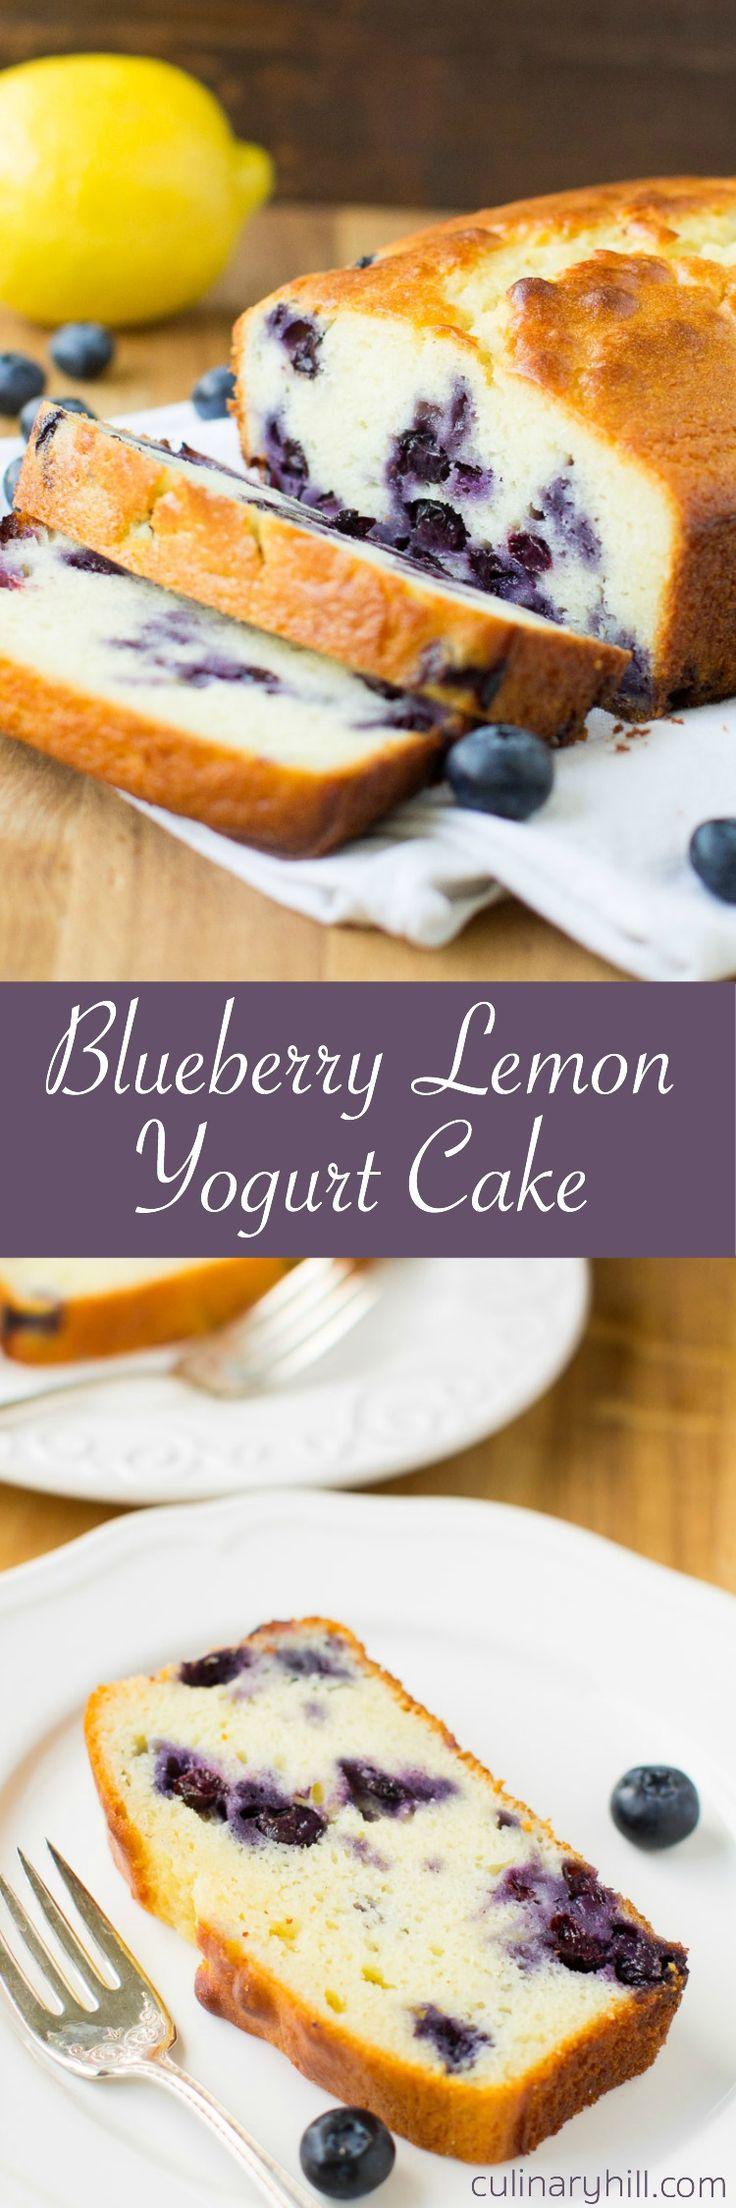 I've updated my favorite Lemon Yogurt Cake recipe with juicy blueberries and rich Greek yogurt. The resu